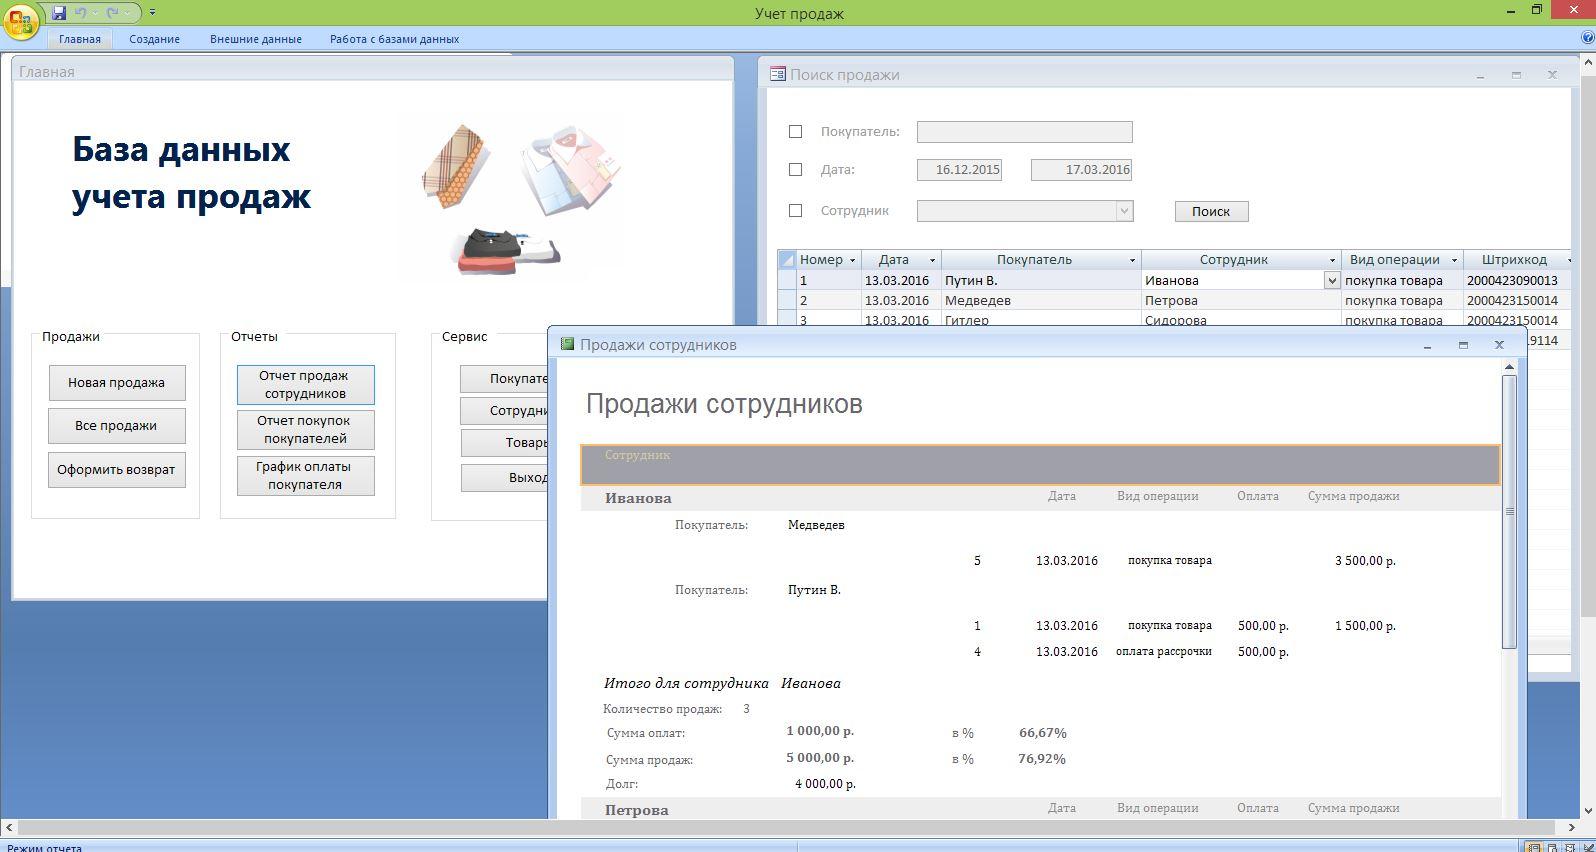 База данных по учету продаж малого предприятия